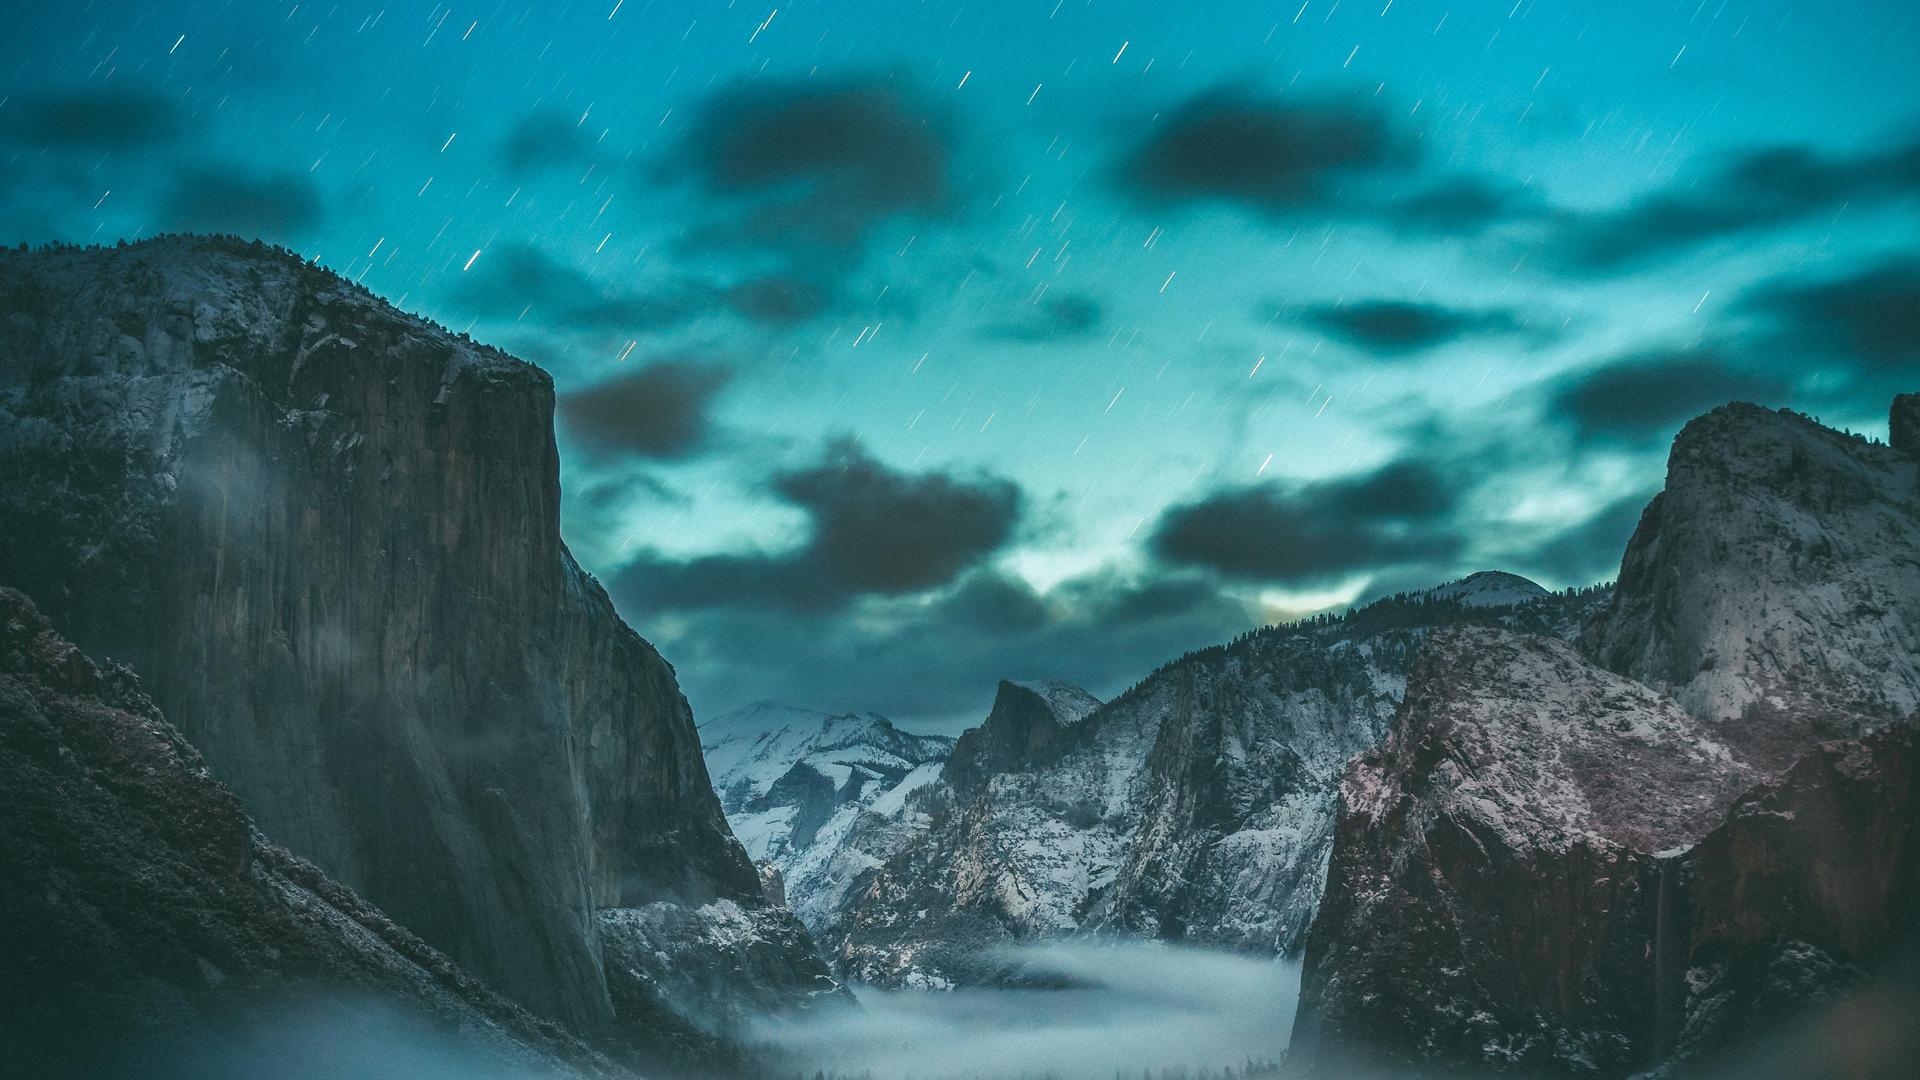 1920x1080 Yosemite Valley Landscape 4k Laptop Full HD ...